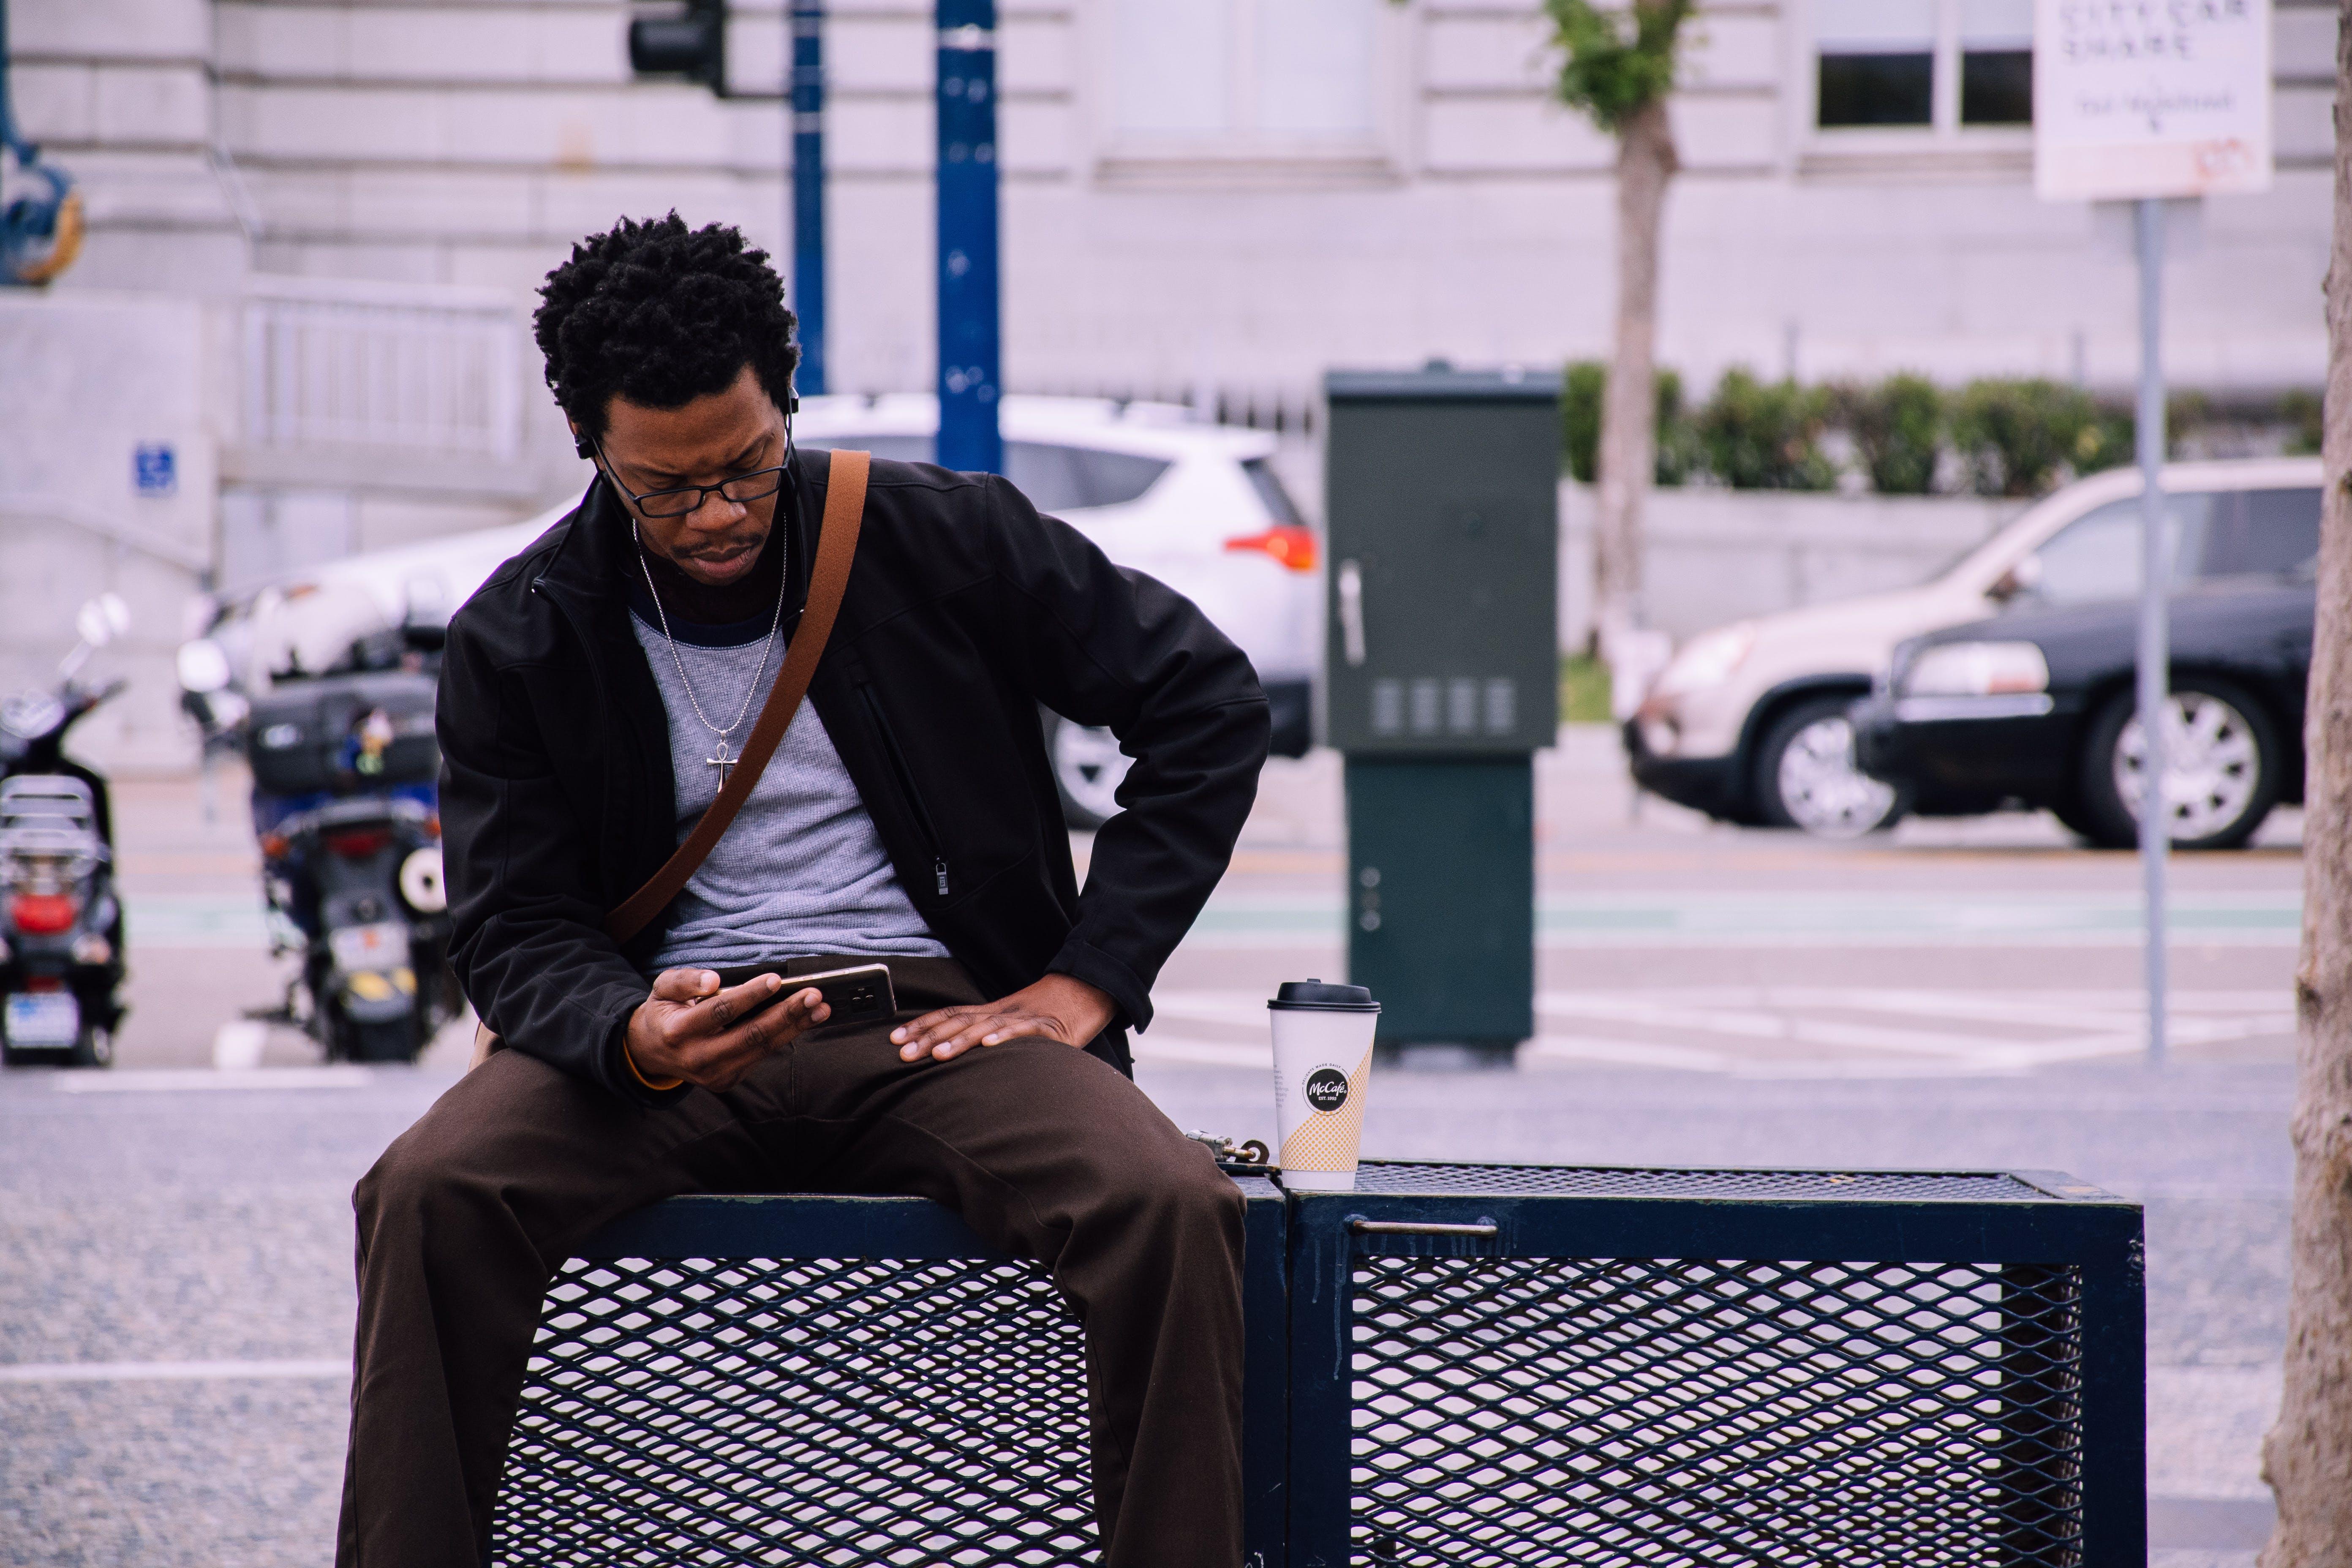 Man Wearing Black Bomber Jacket And Holding Smartphone